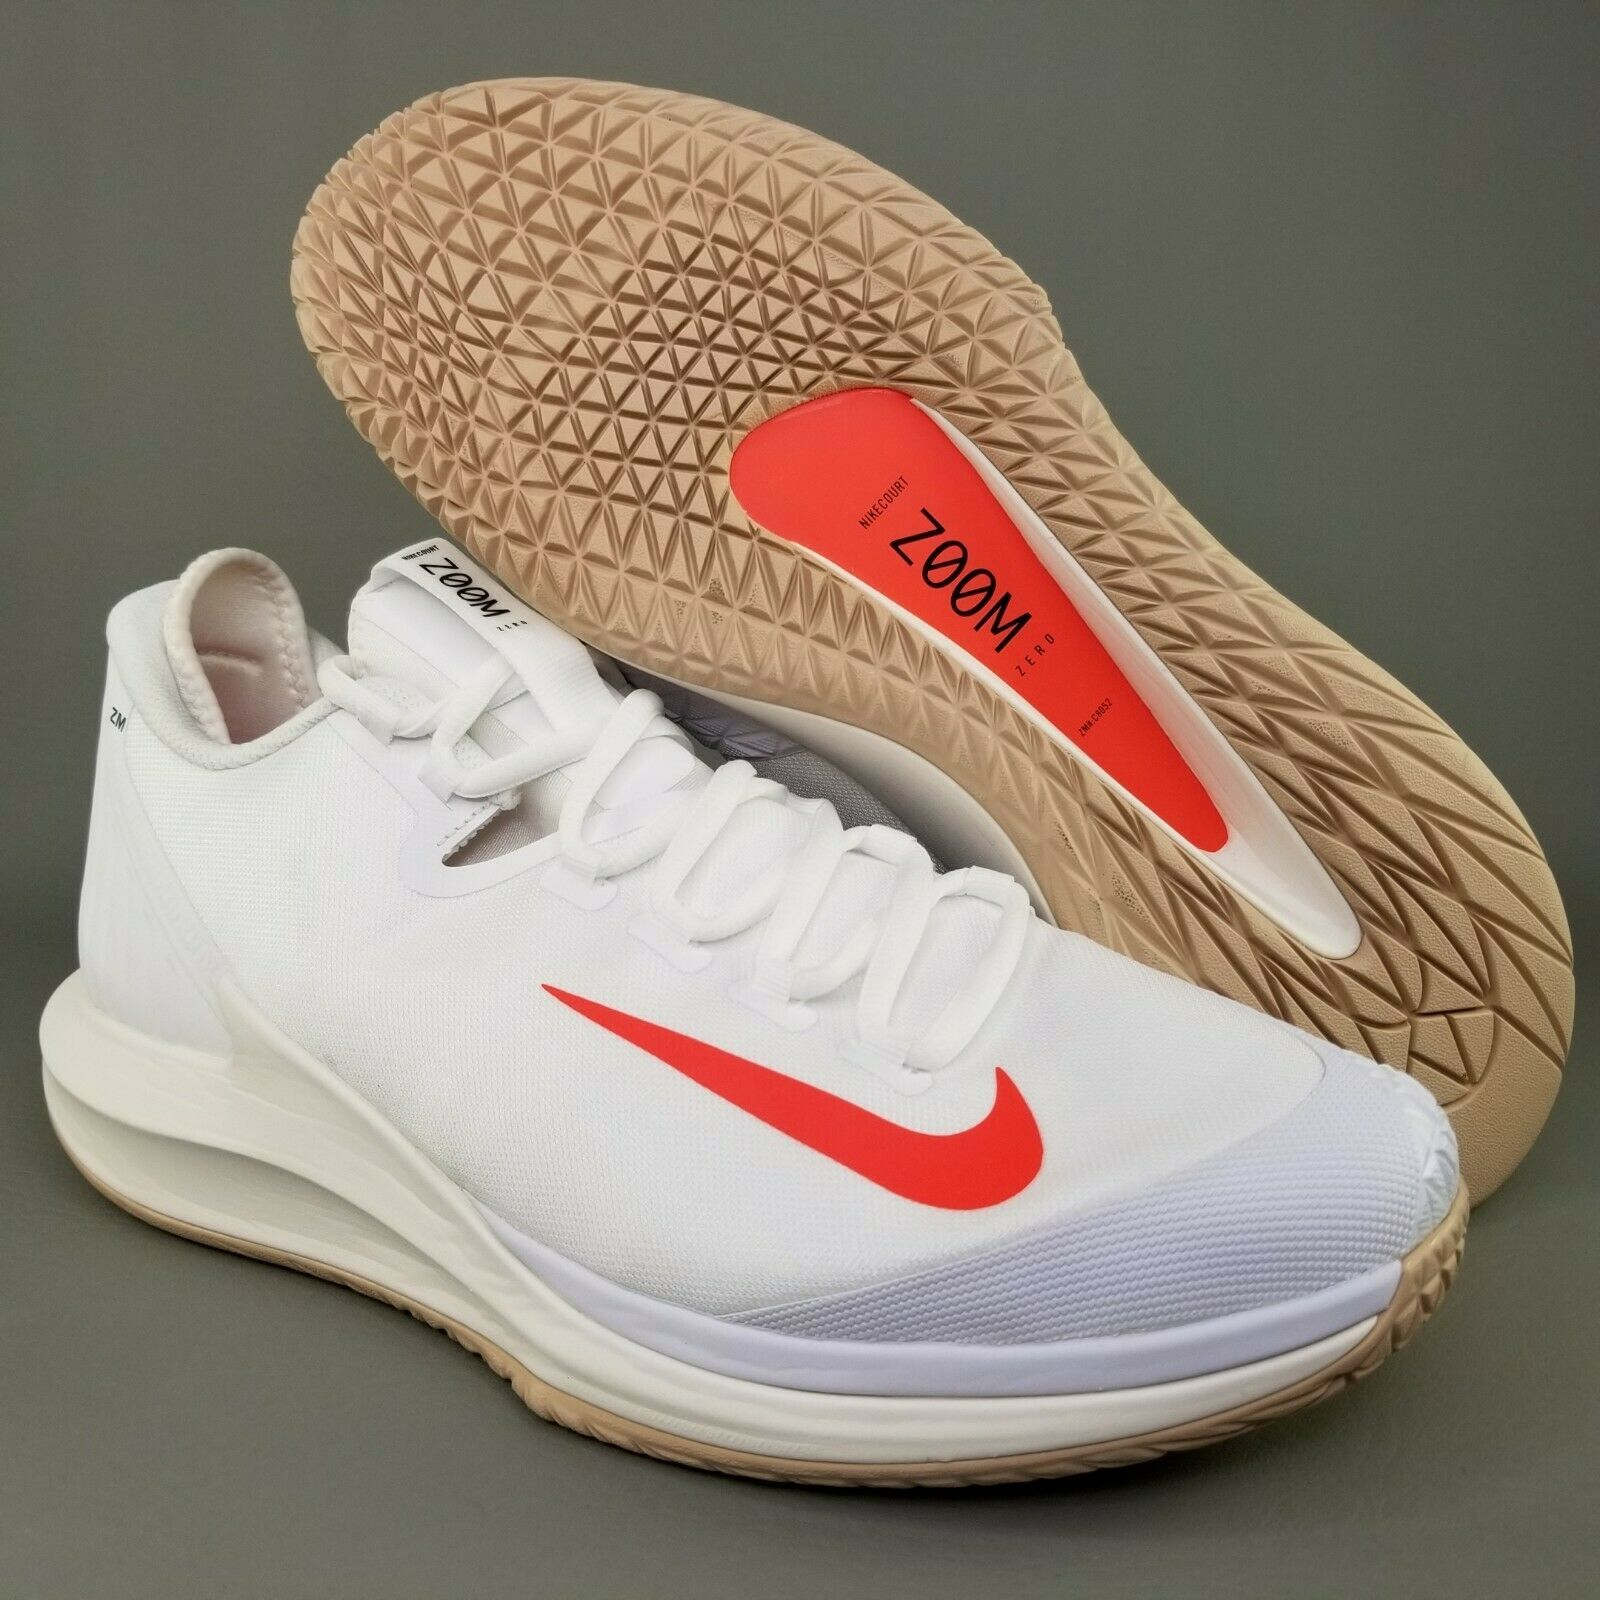 new style 23778 56cdc 57. 57. Previous. Nike Court Air Zoom Zero Tennis Shoes Size 11 Mens  Sneakers White Crimson Black